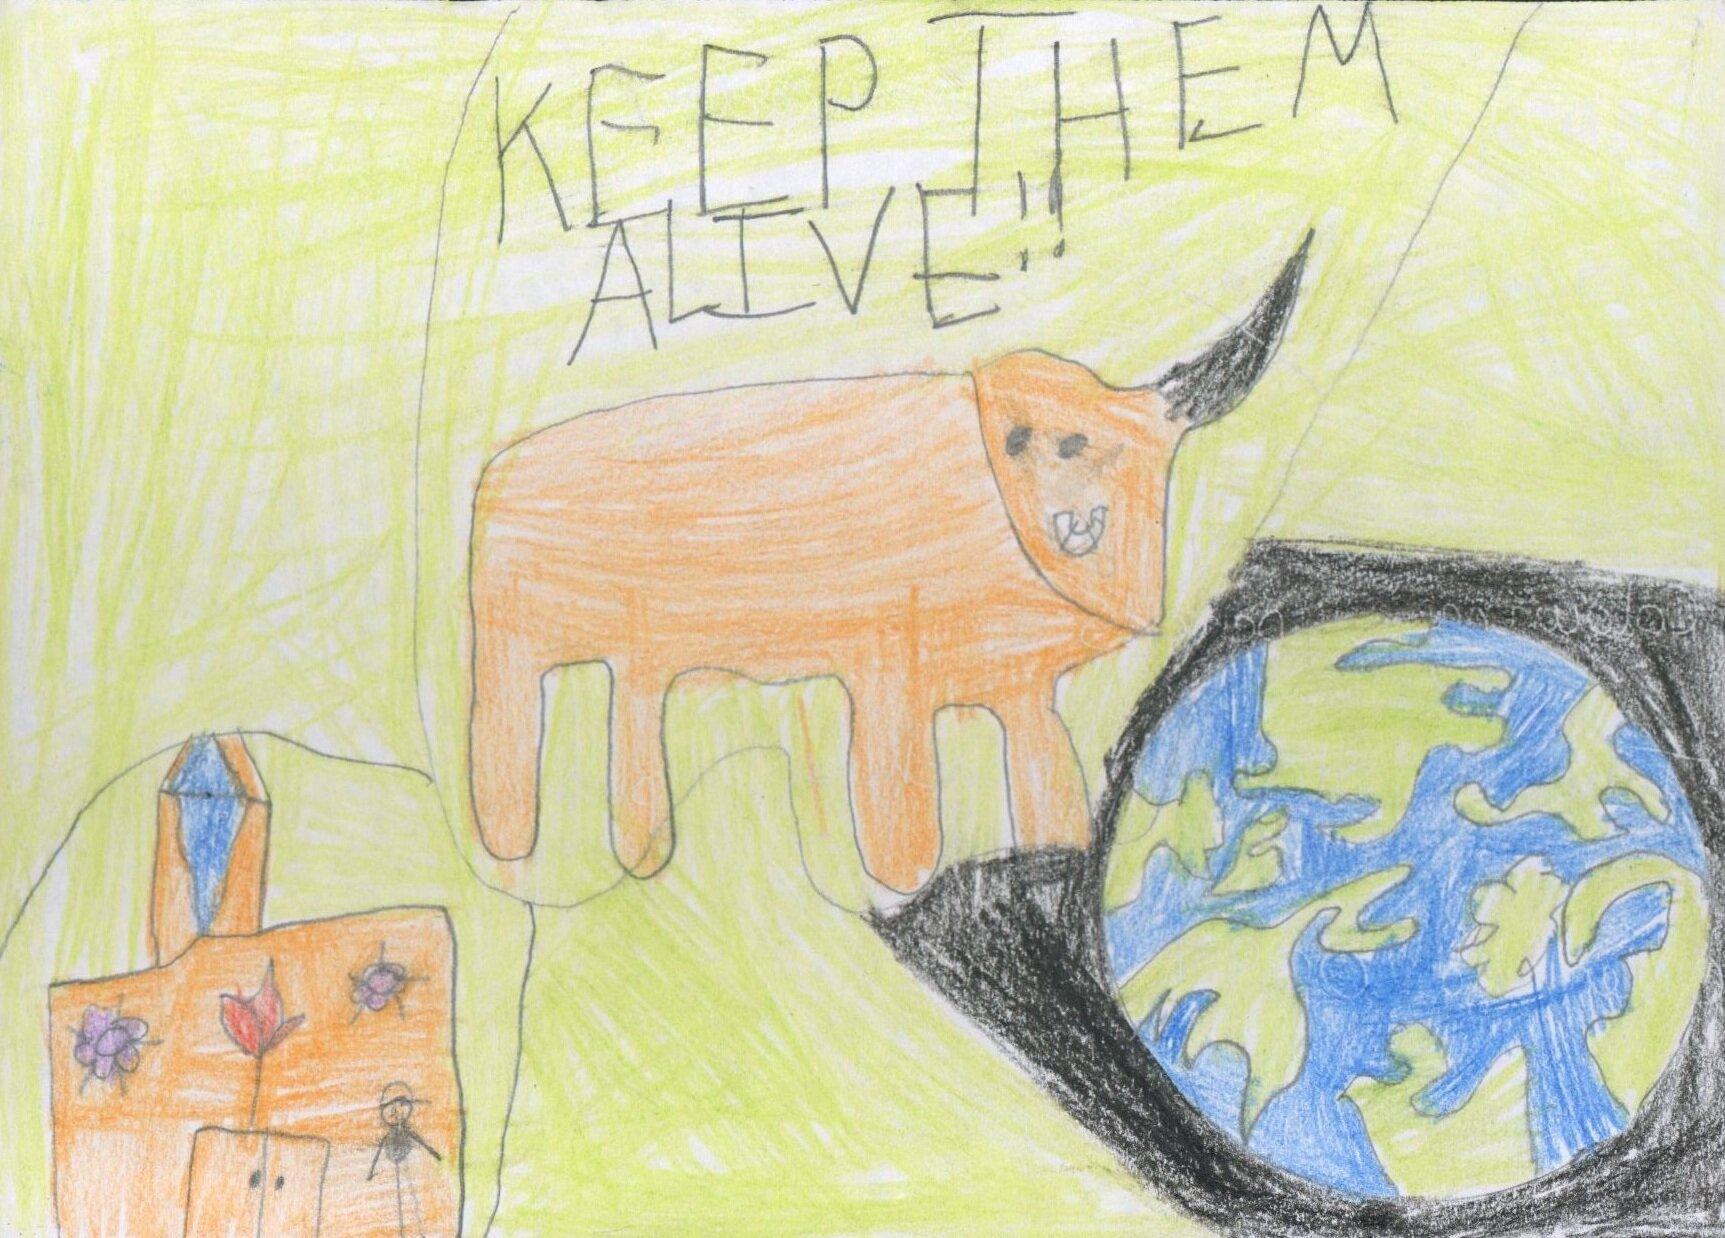 Prize Winner  Best animal extinction message  Caiden aged 8